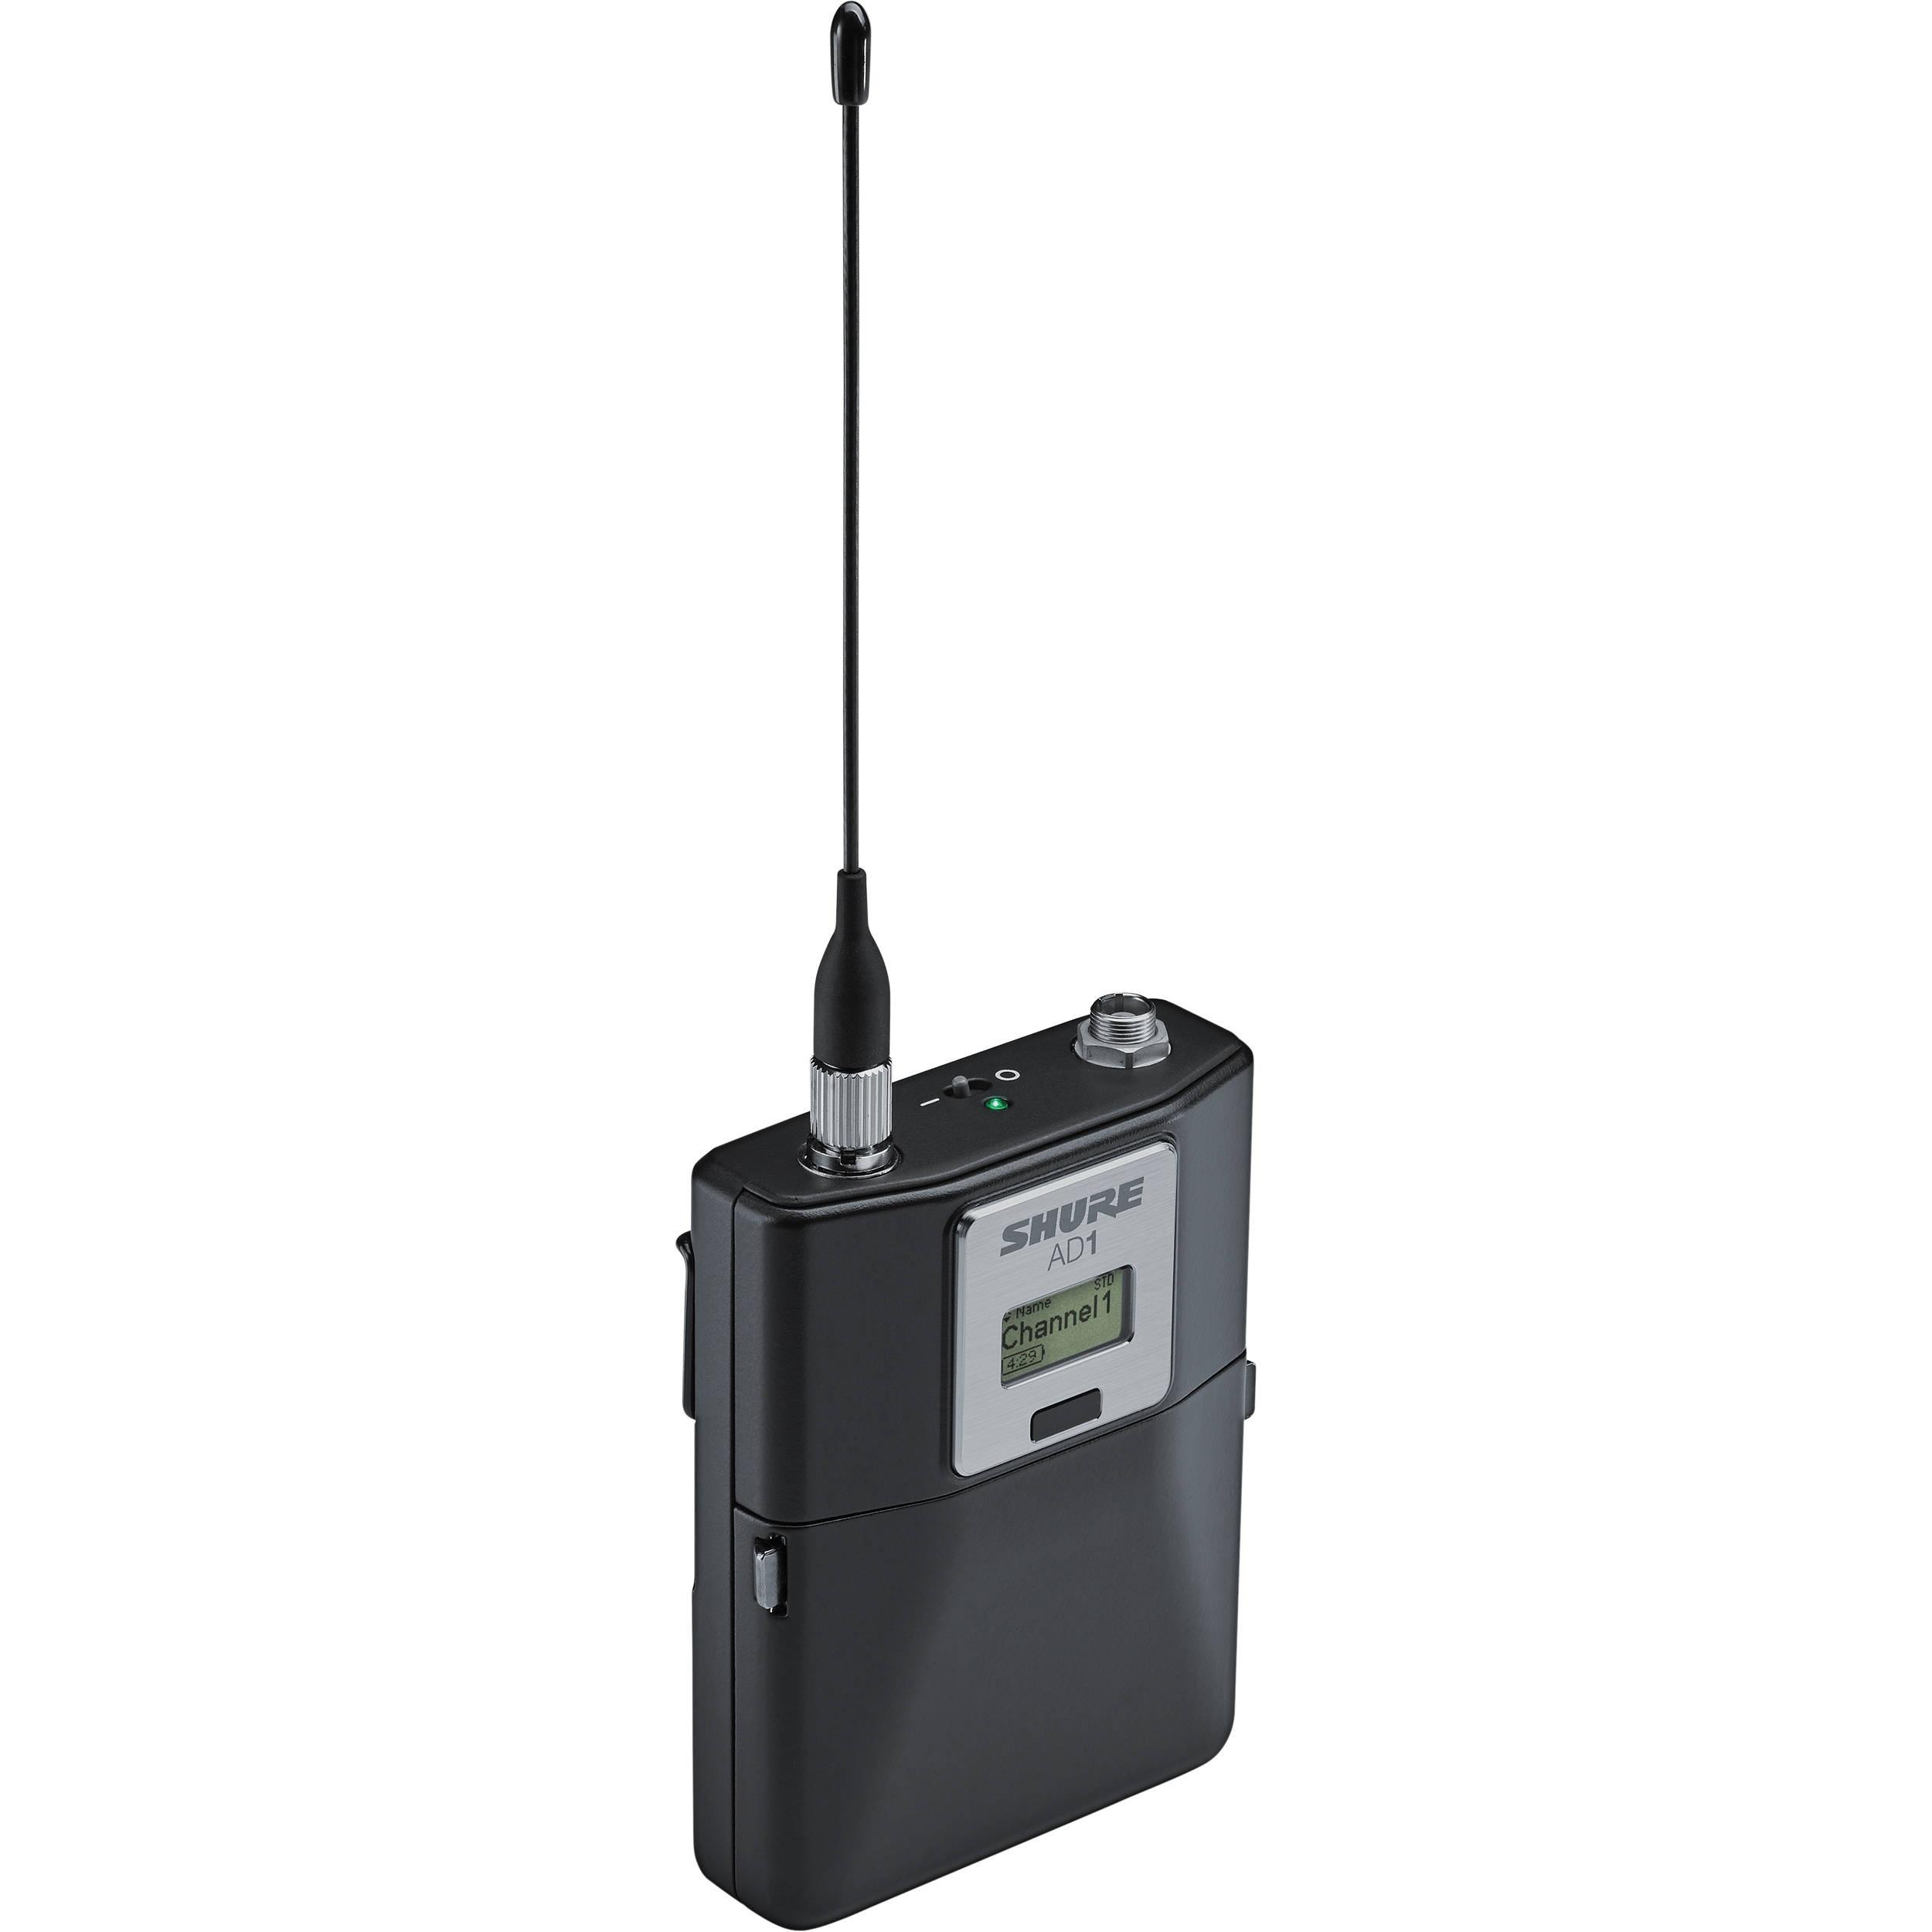 Shure AD1 Digital Wireless Bodypack Transmitter with LEMO3